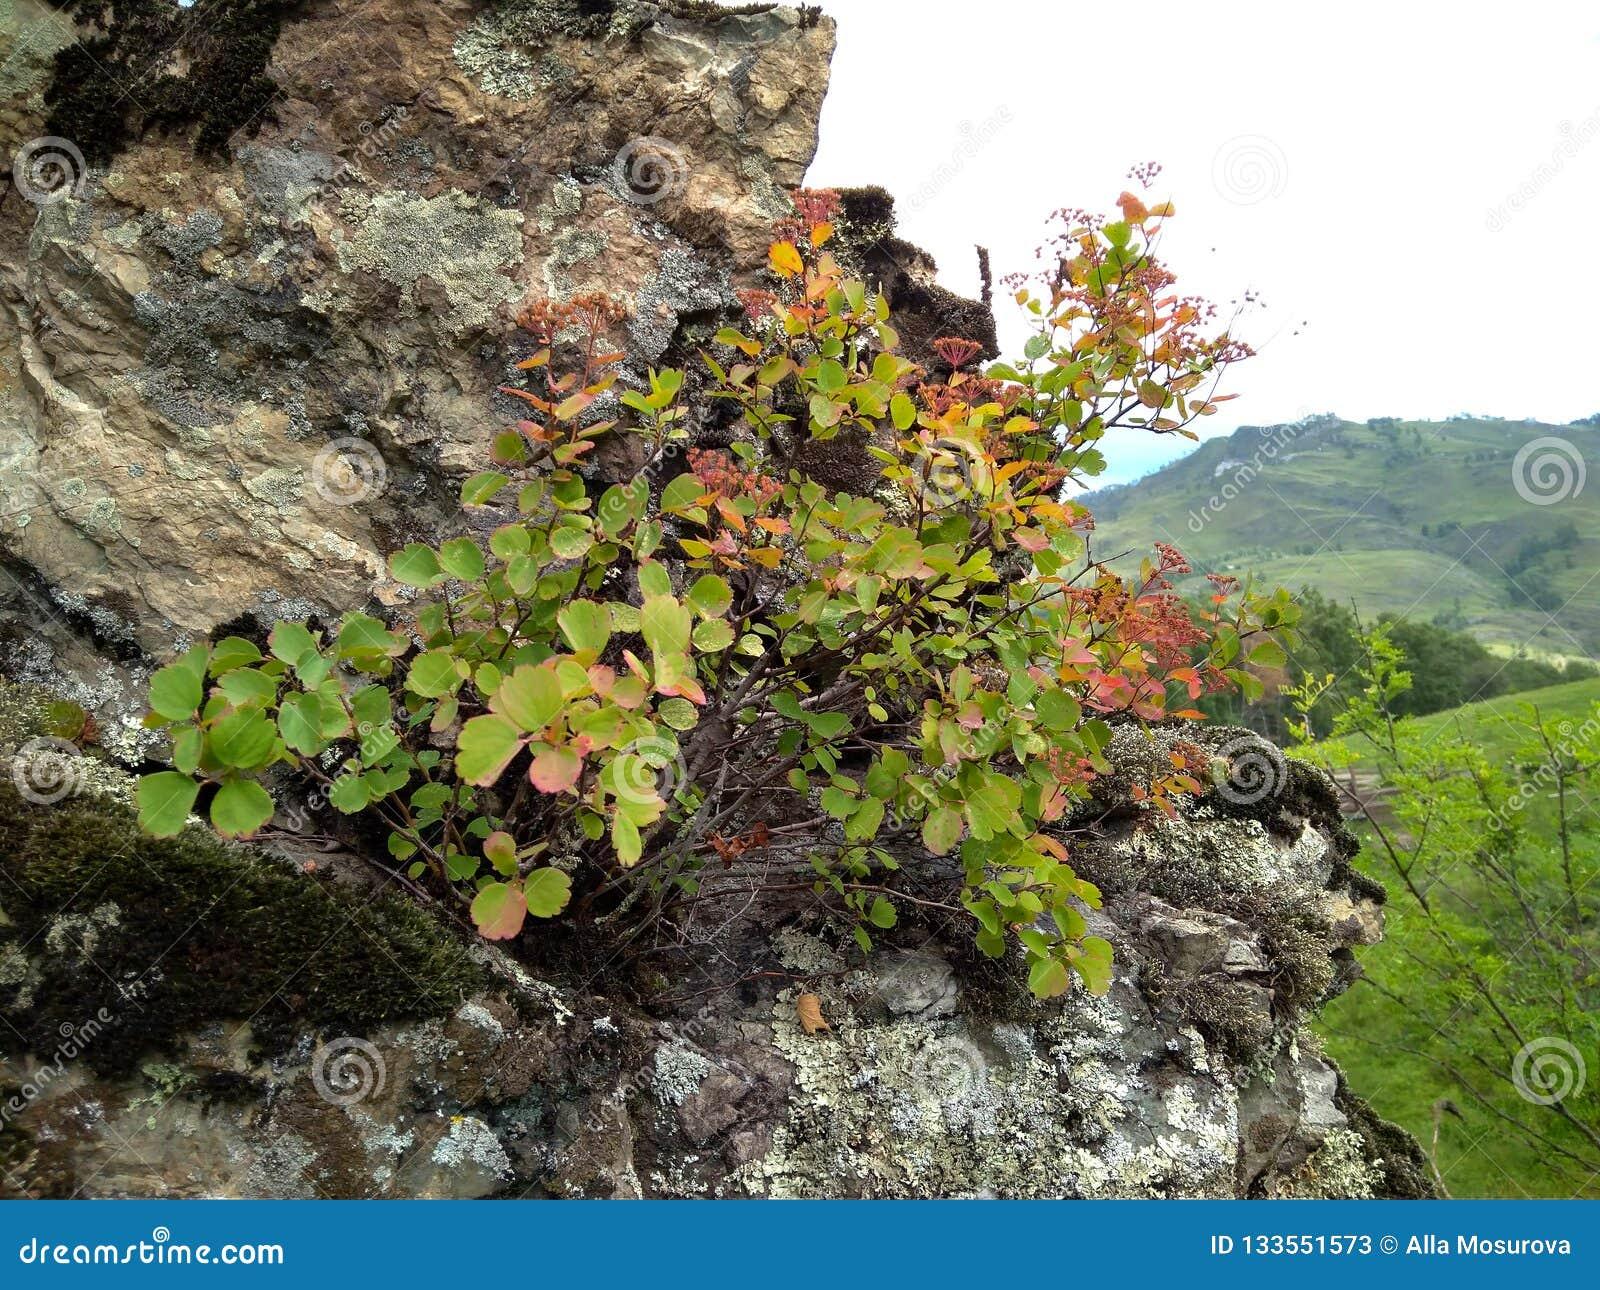 Mountain shrub grows in rocky terrain among rocks on sparse stones